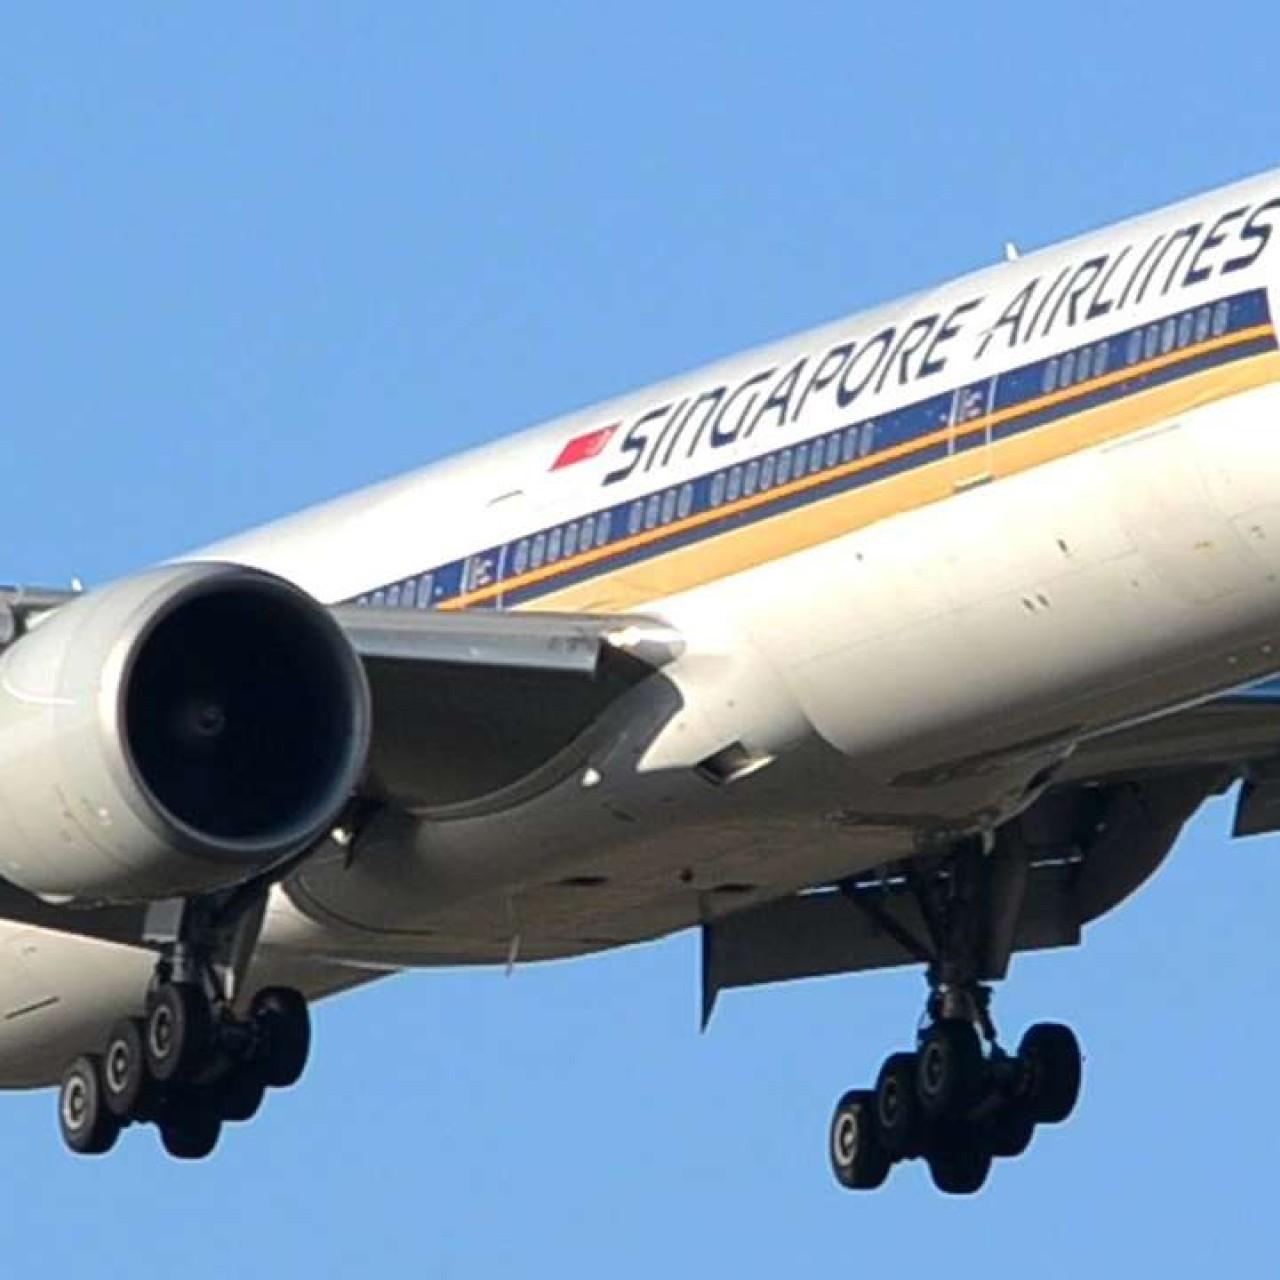 Flight from San Francisco to Hong Kong has to abort landing